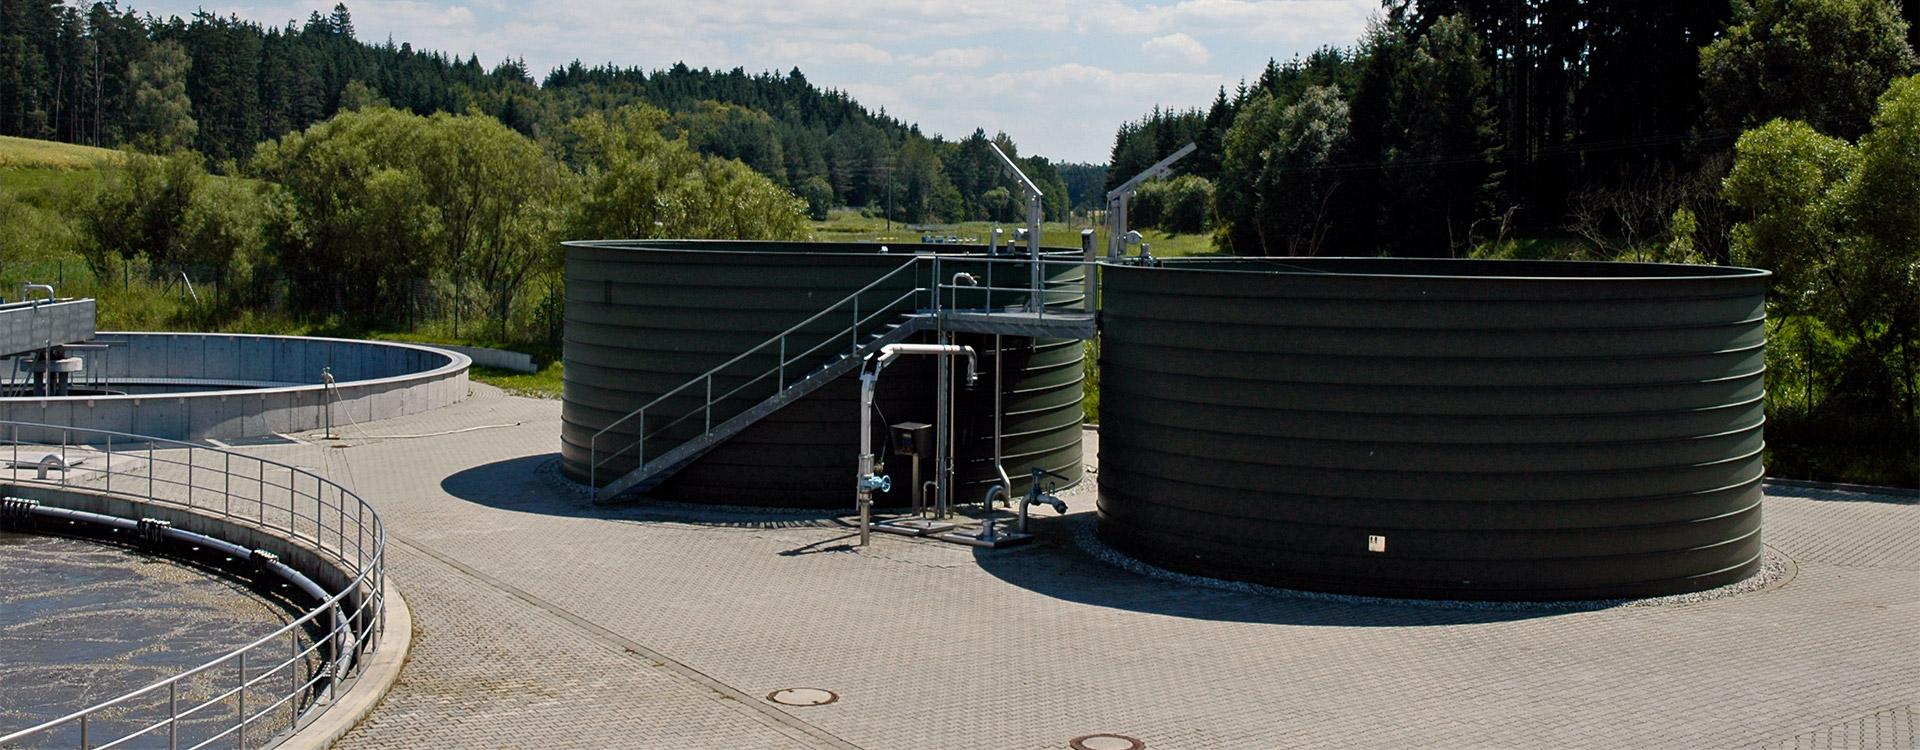 Municipality Storage Plant - Lipp System